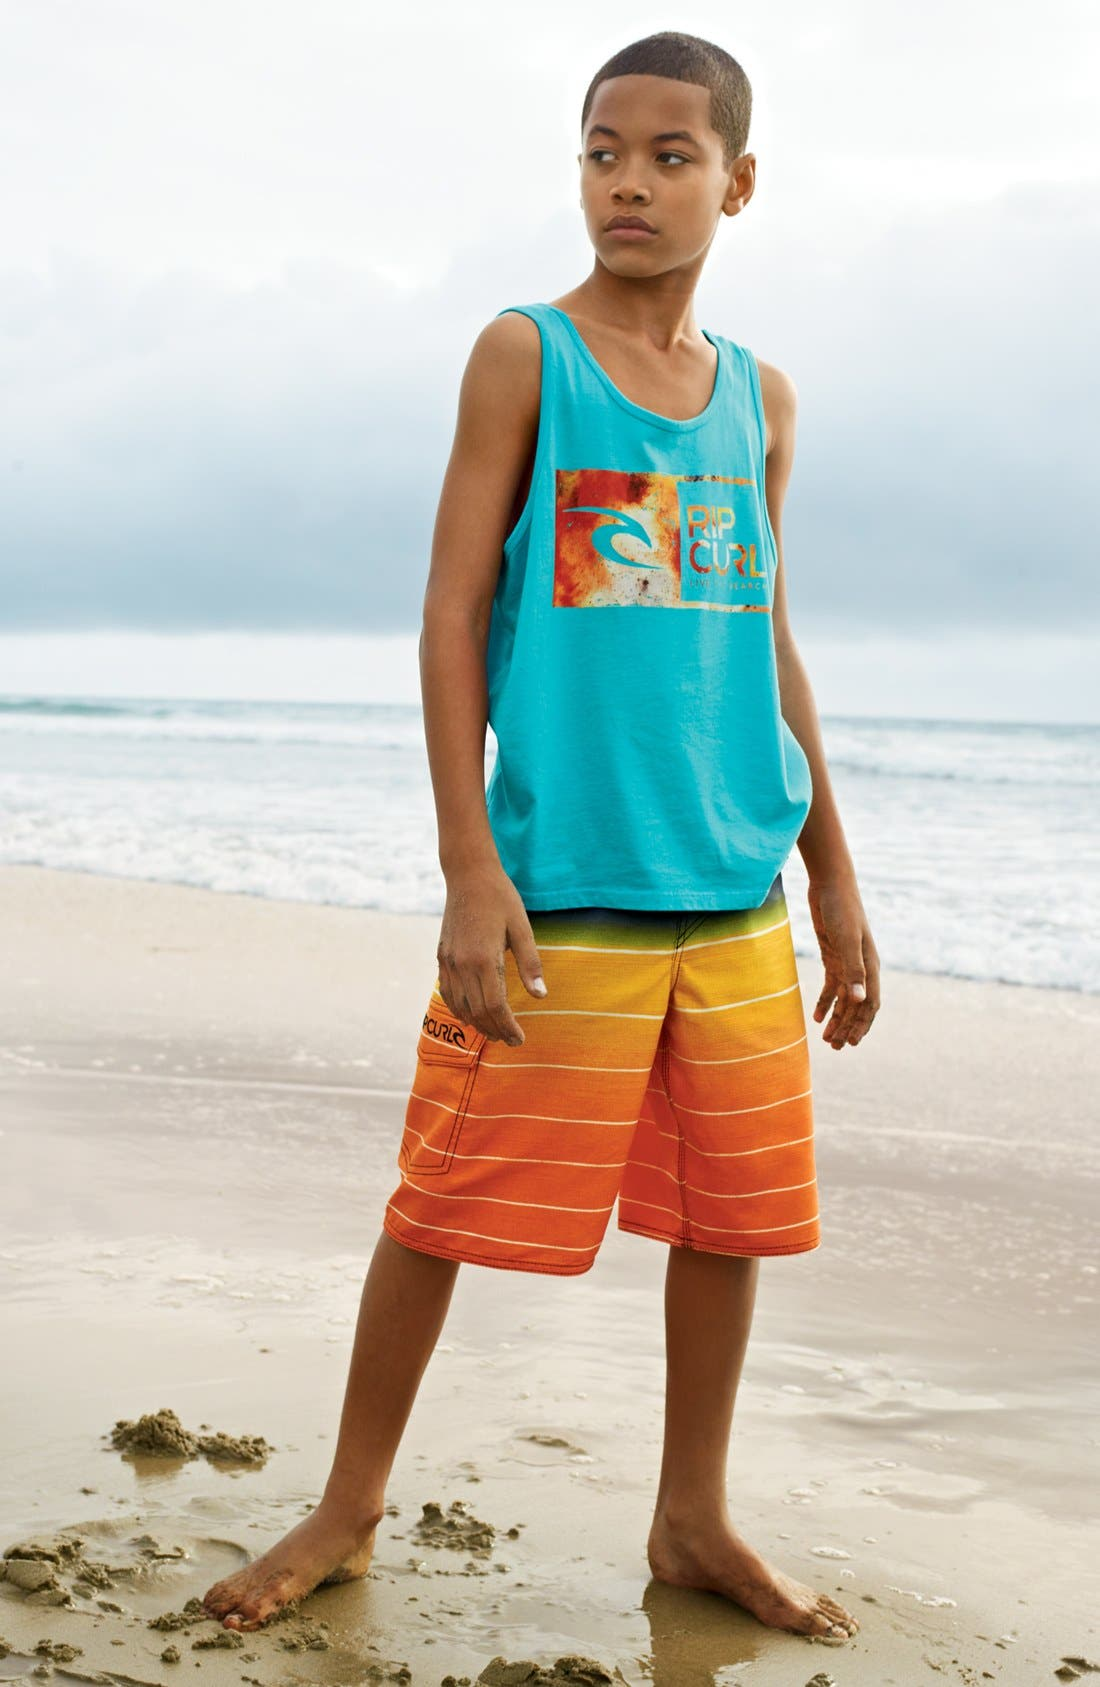 Main Image - Rip Curl Tank & Board Shorts